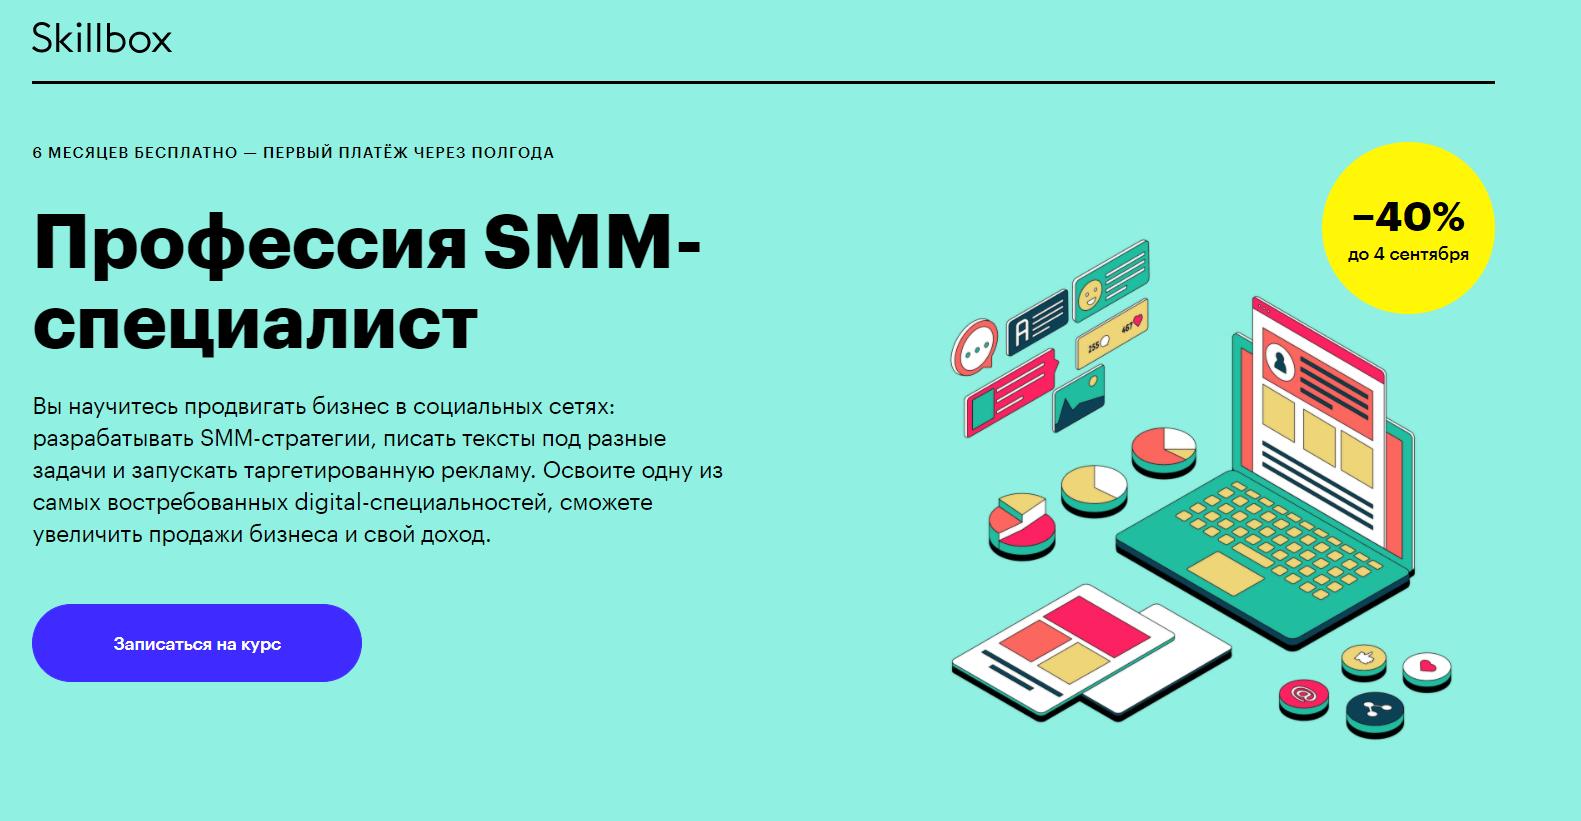 SMM-специалист от Skillbox